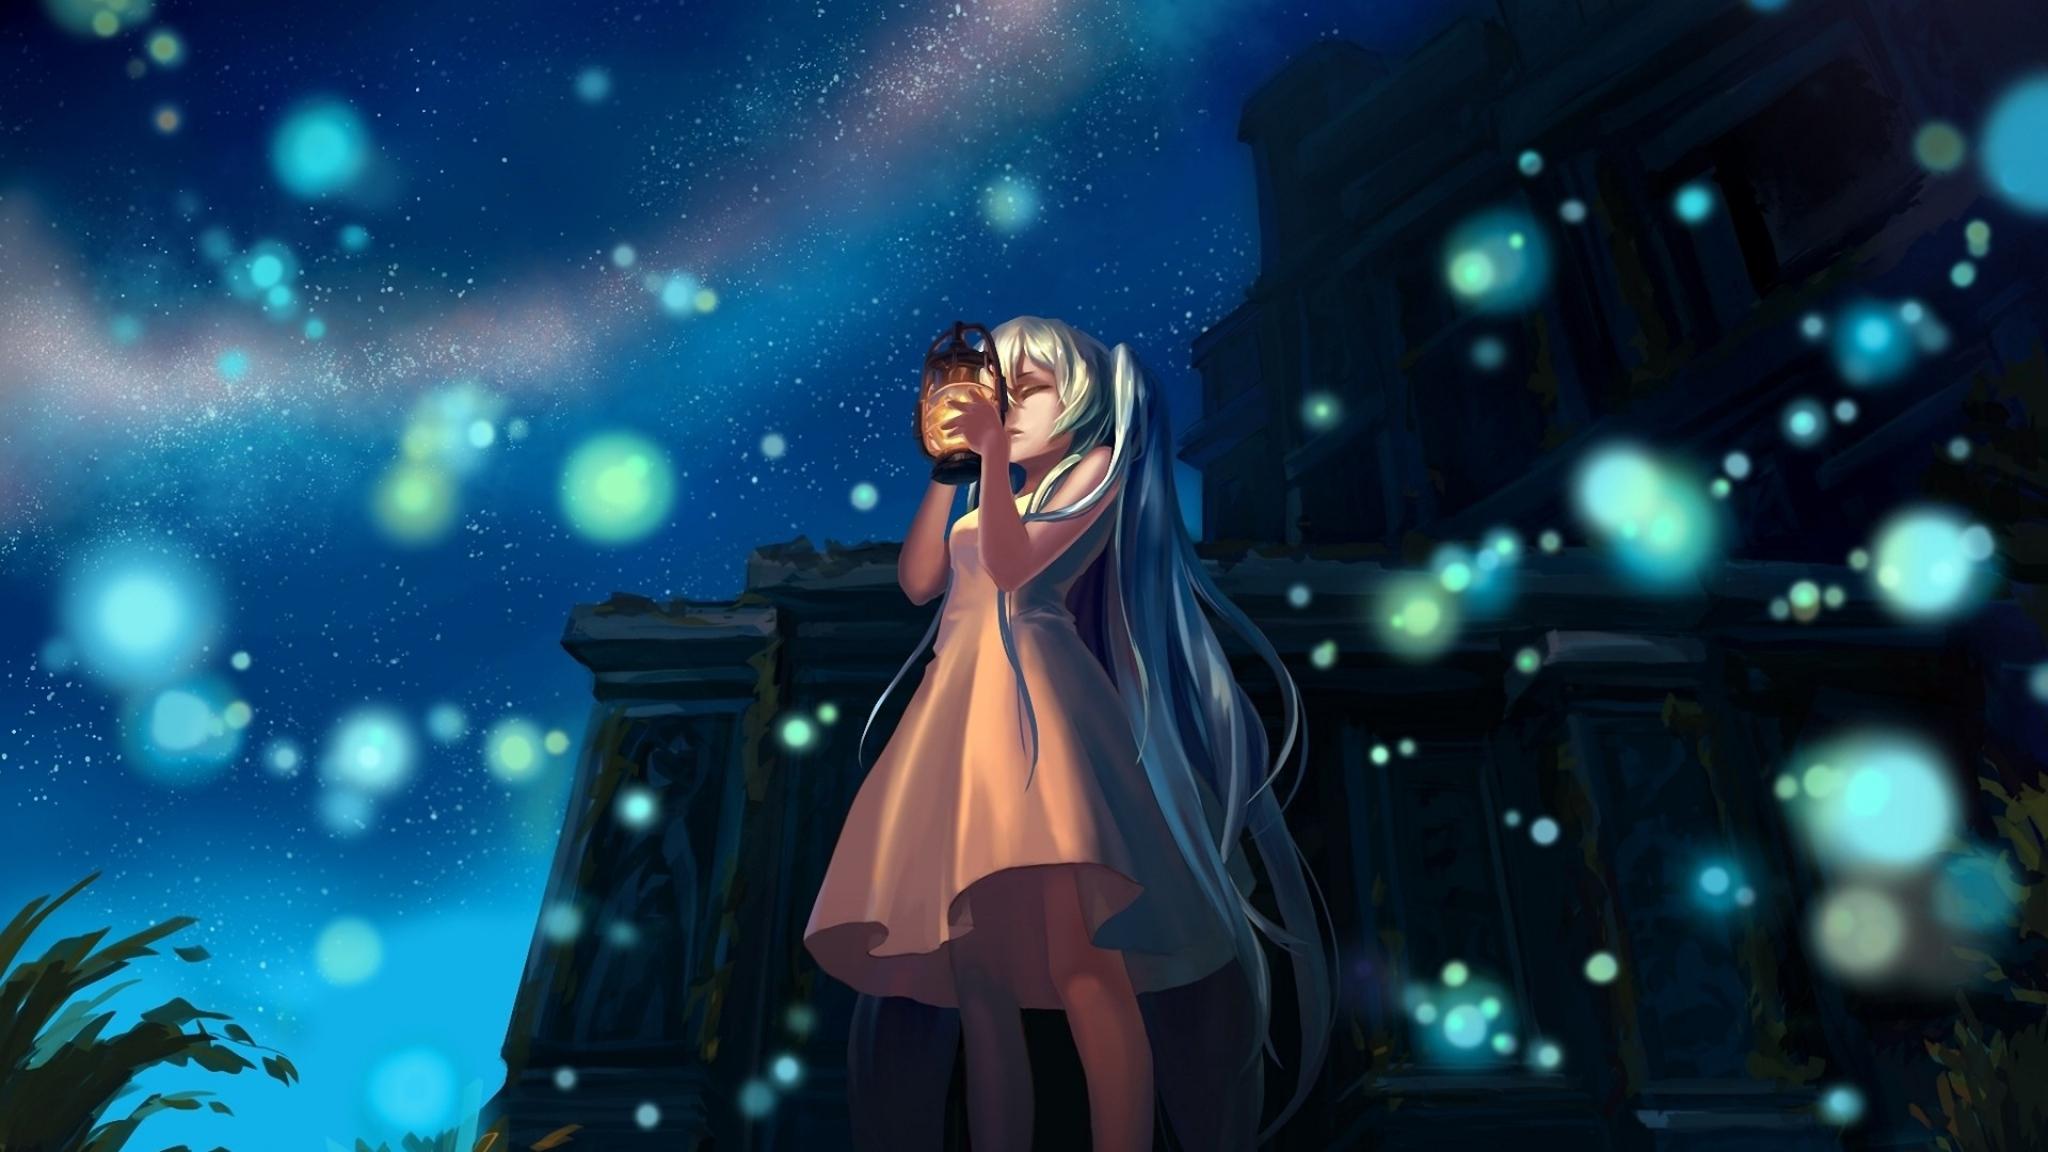 50 2048x1152 Anime Wallpaper On Wallpapersafari